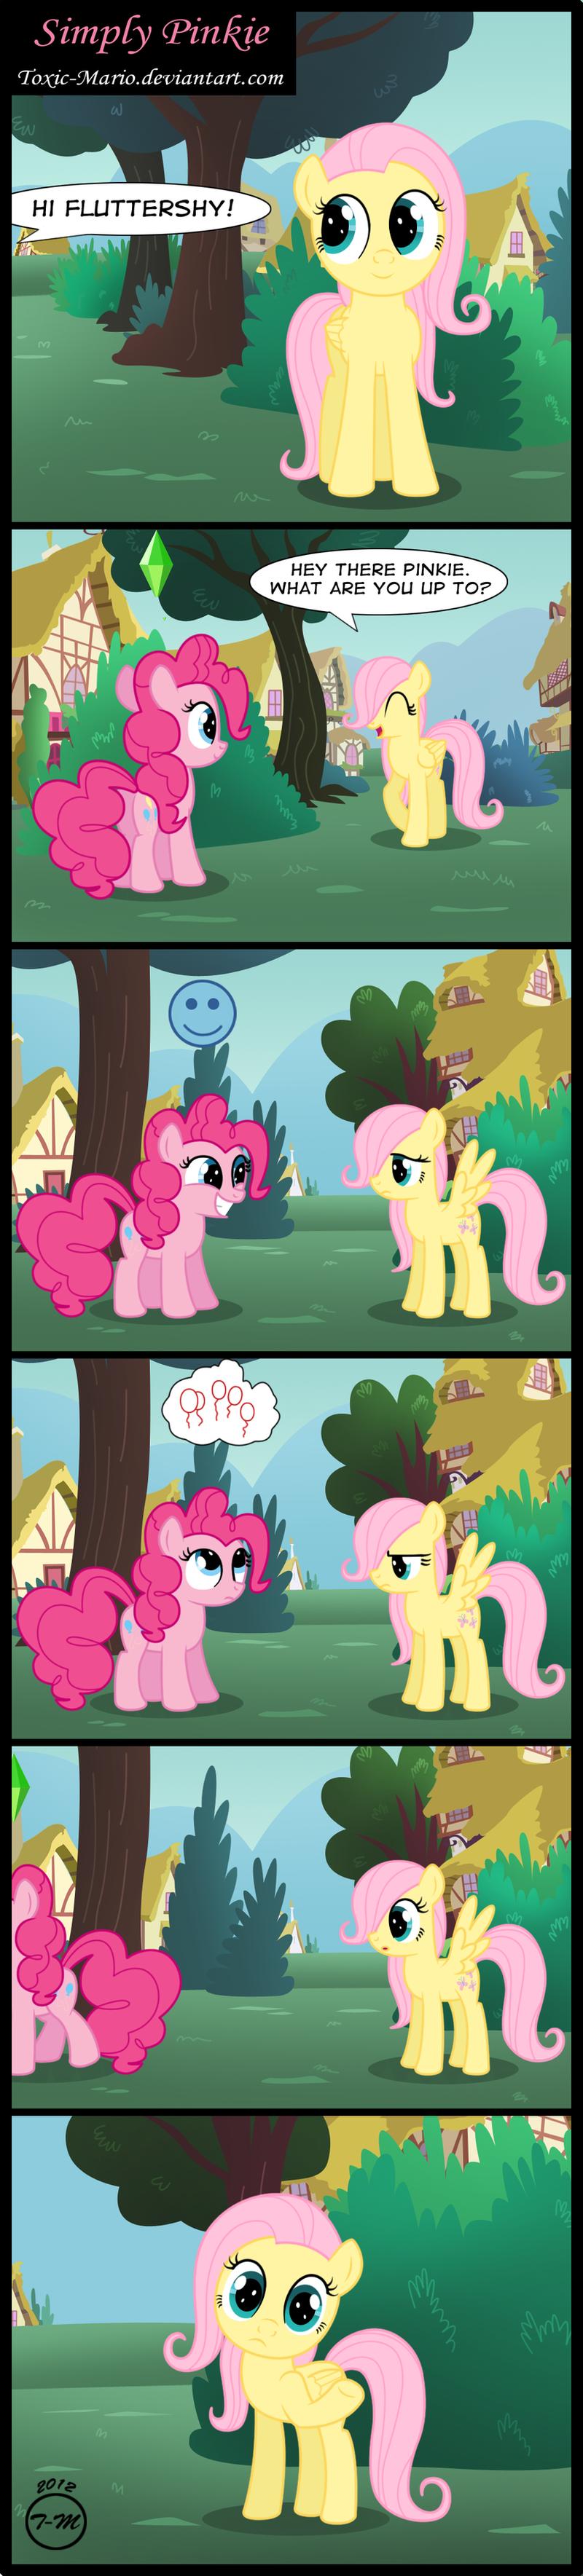 Simply Pinkie by Toxic-Mario